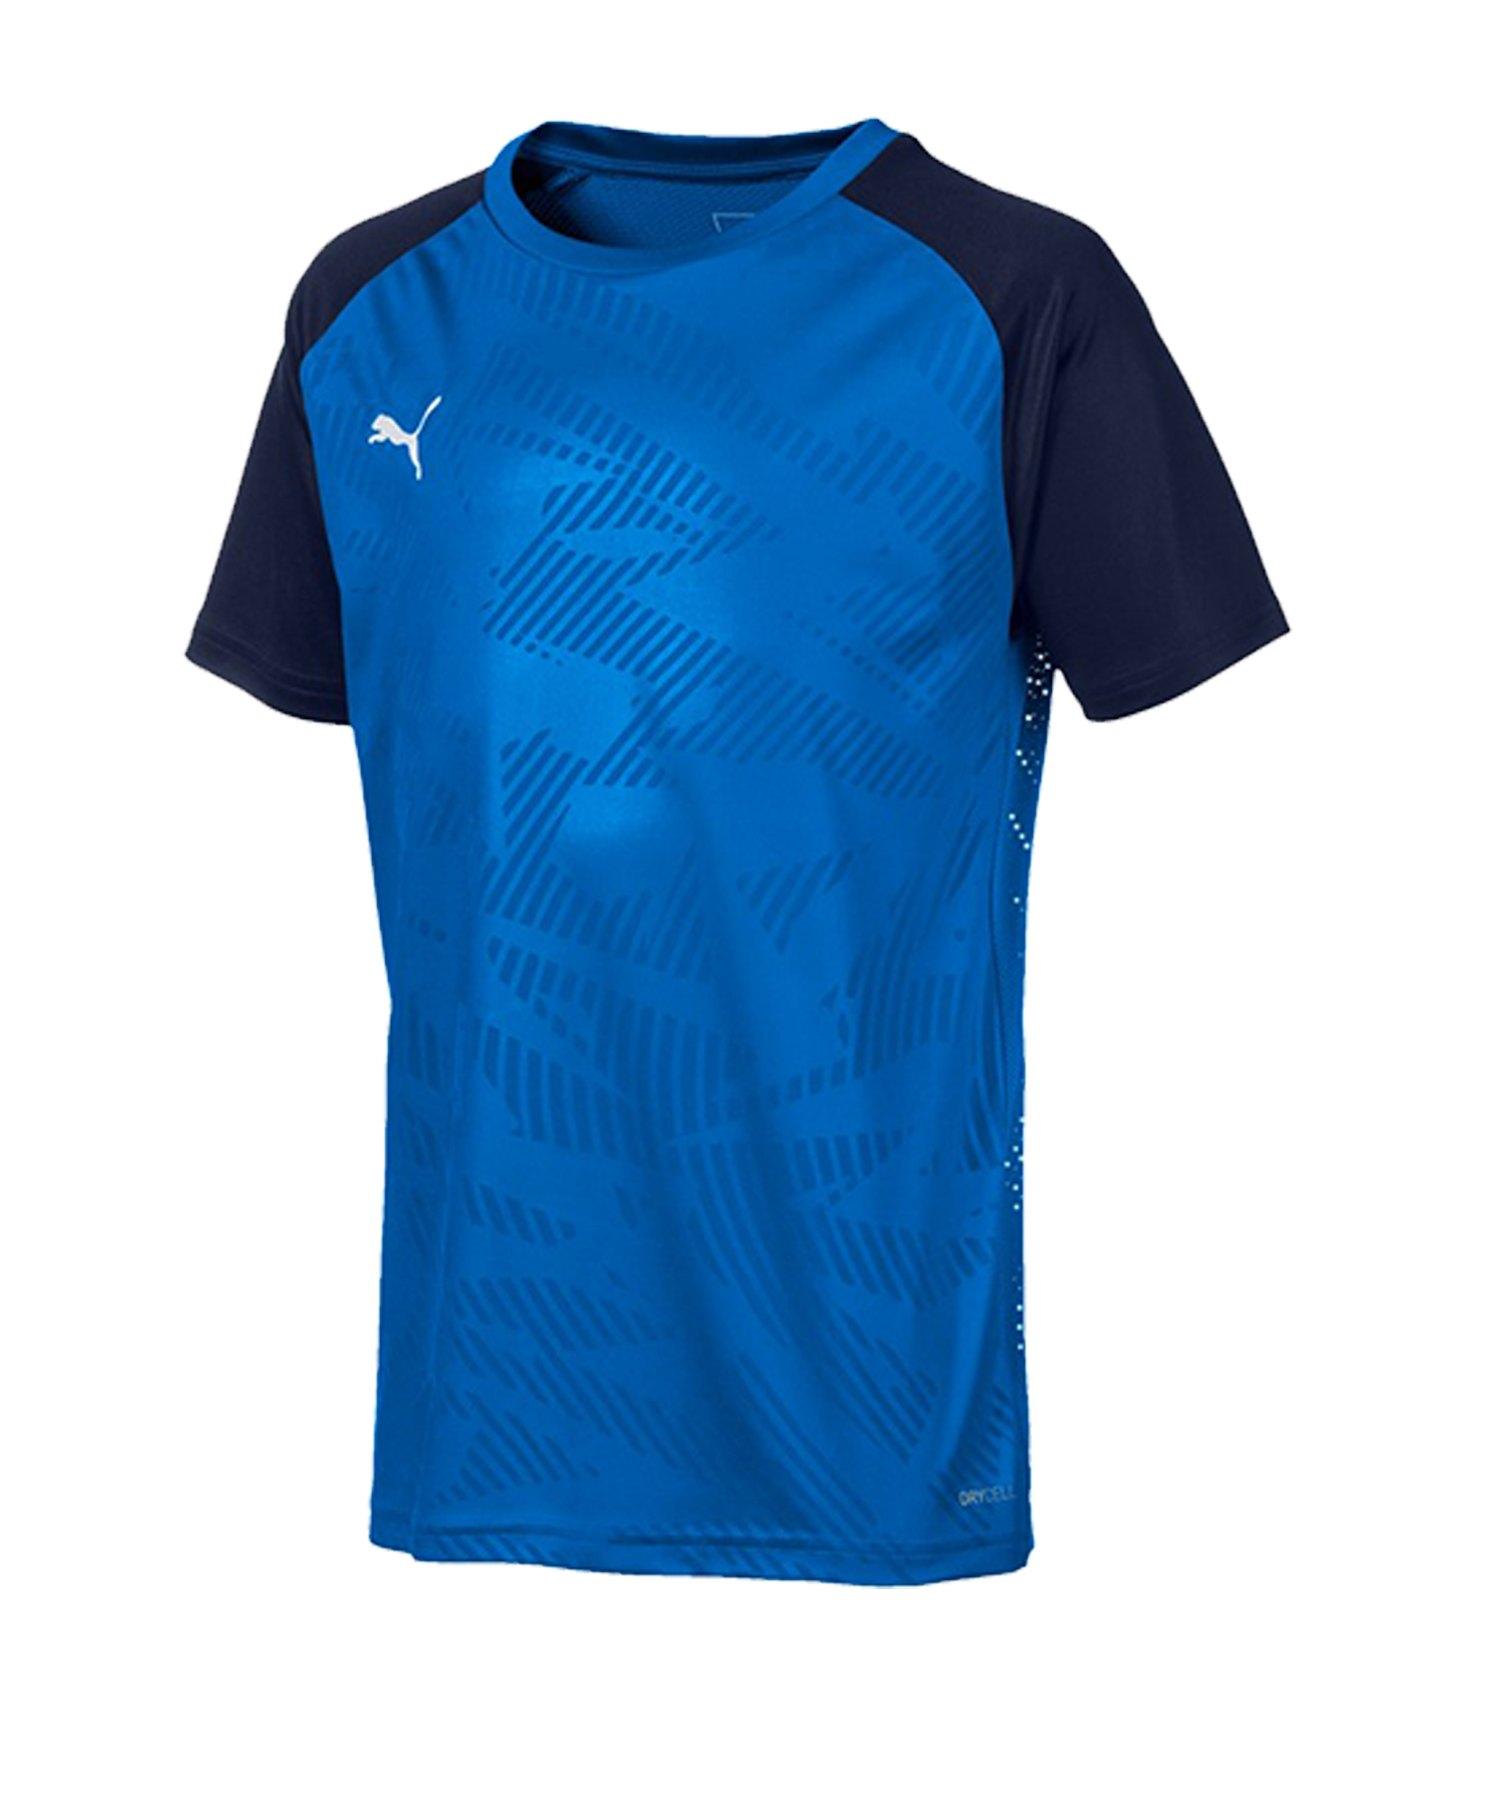 PUMA CUP Training Core T-Shirt Kids Blau F02 - blau